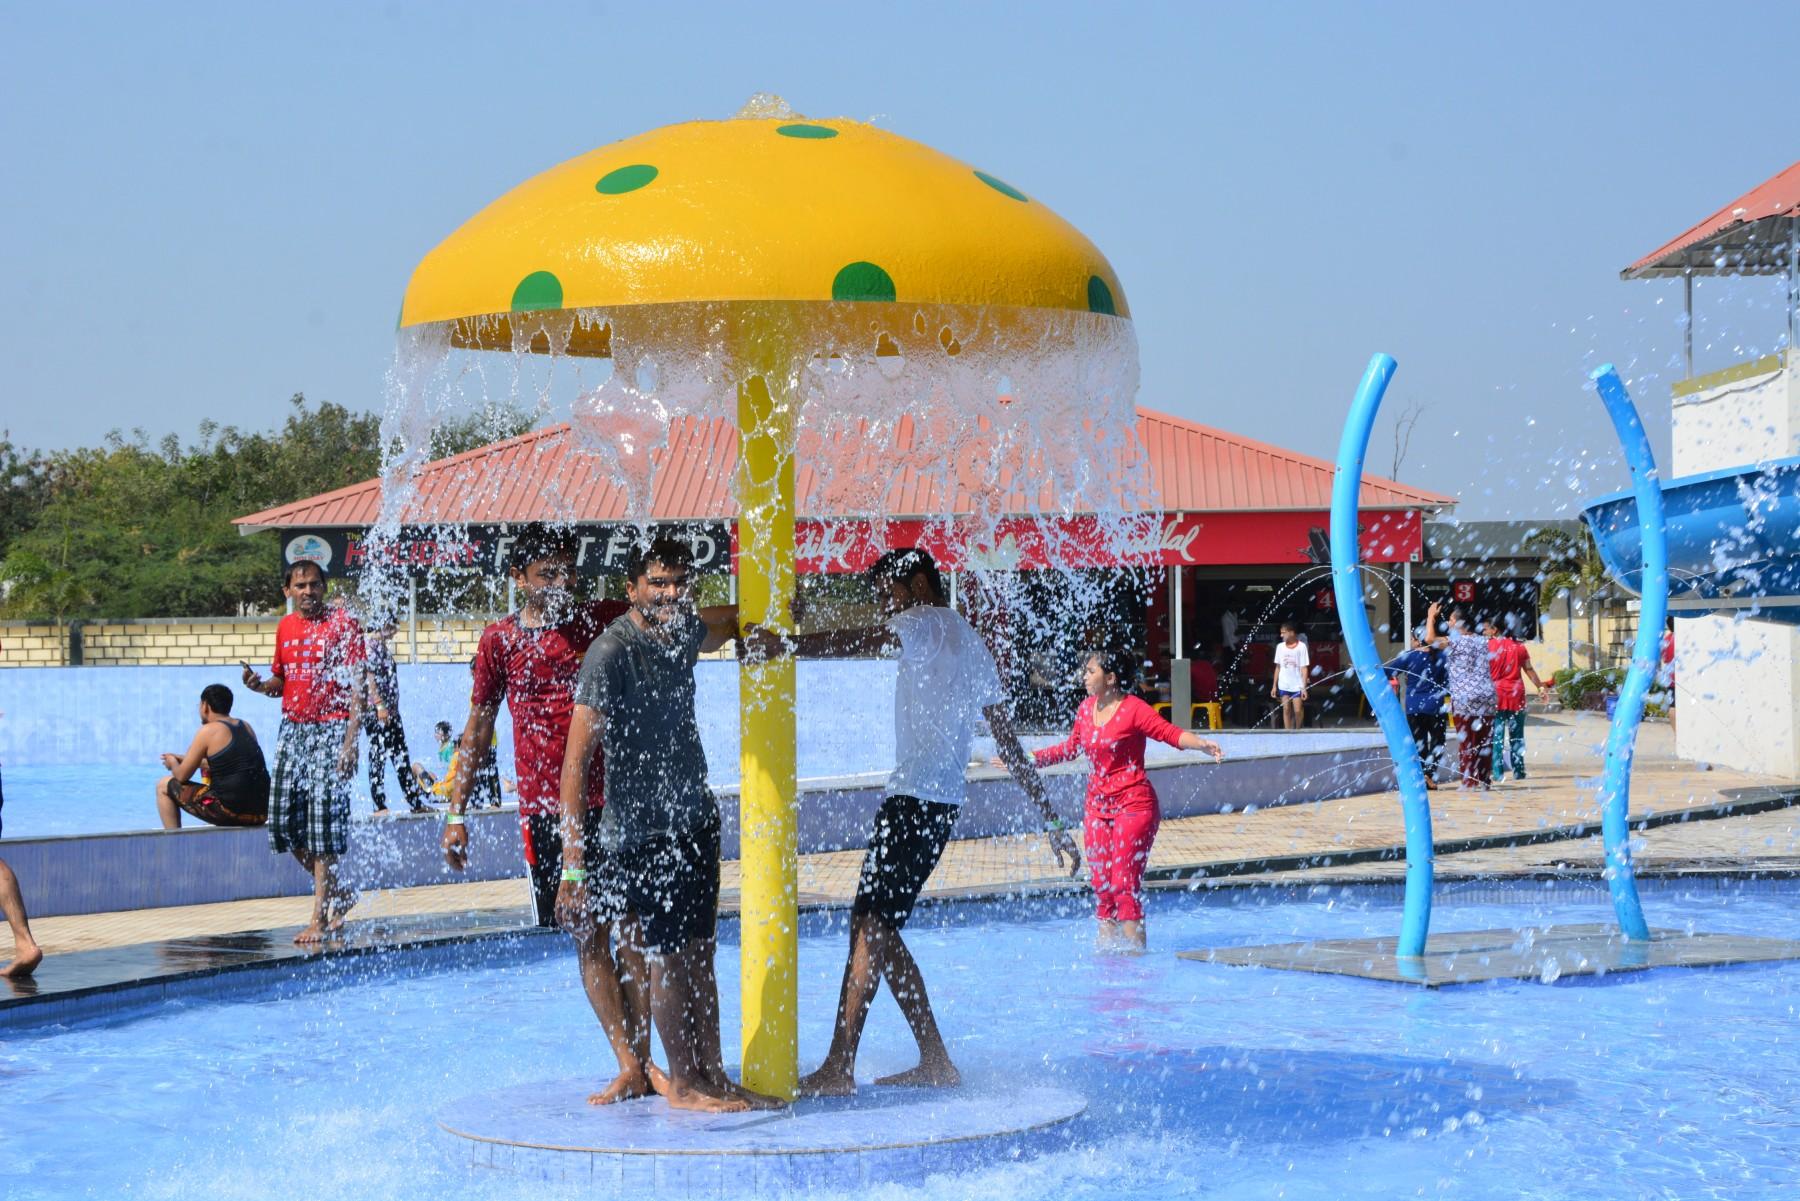 The Holiday Water Park and Resort in Jamnagar